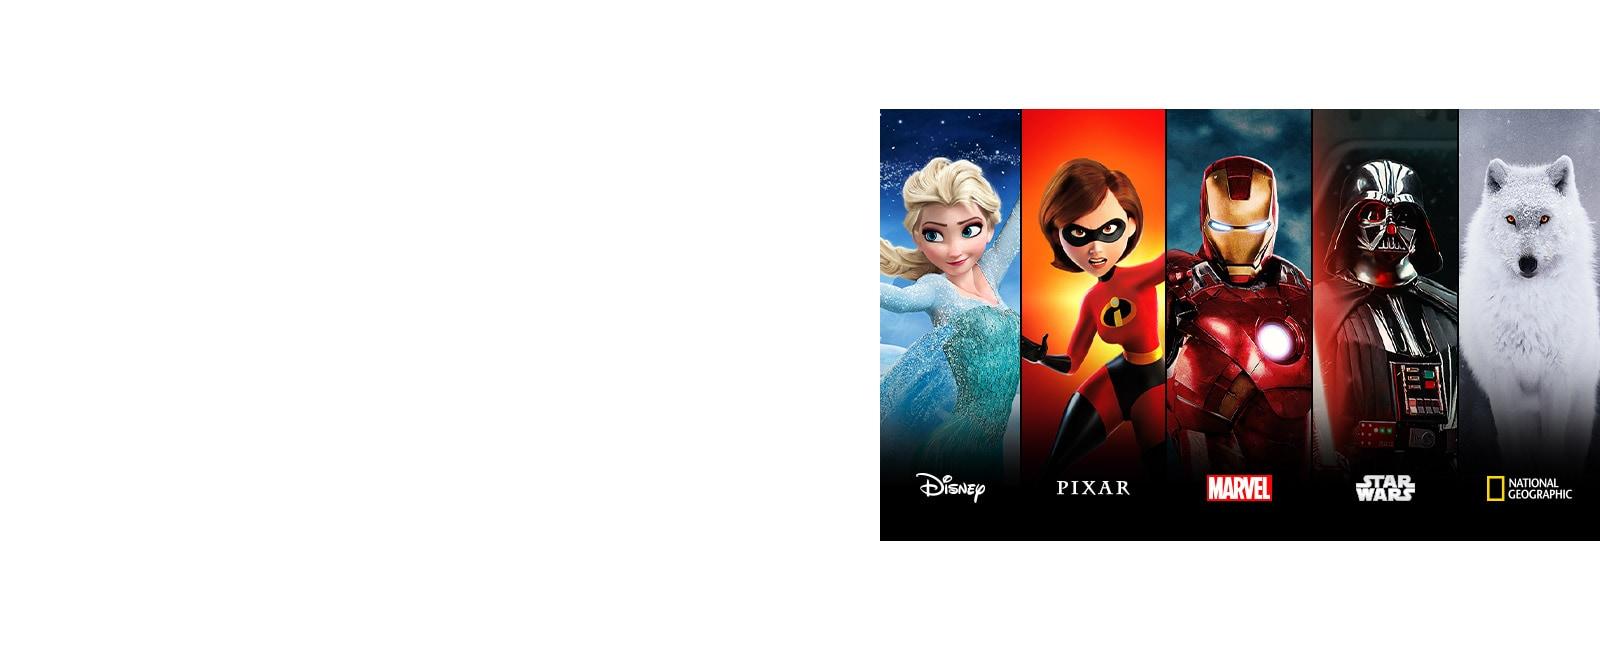 LG OLED55CXPTA Disney+